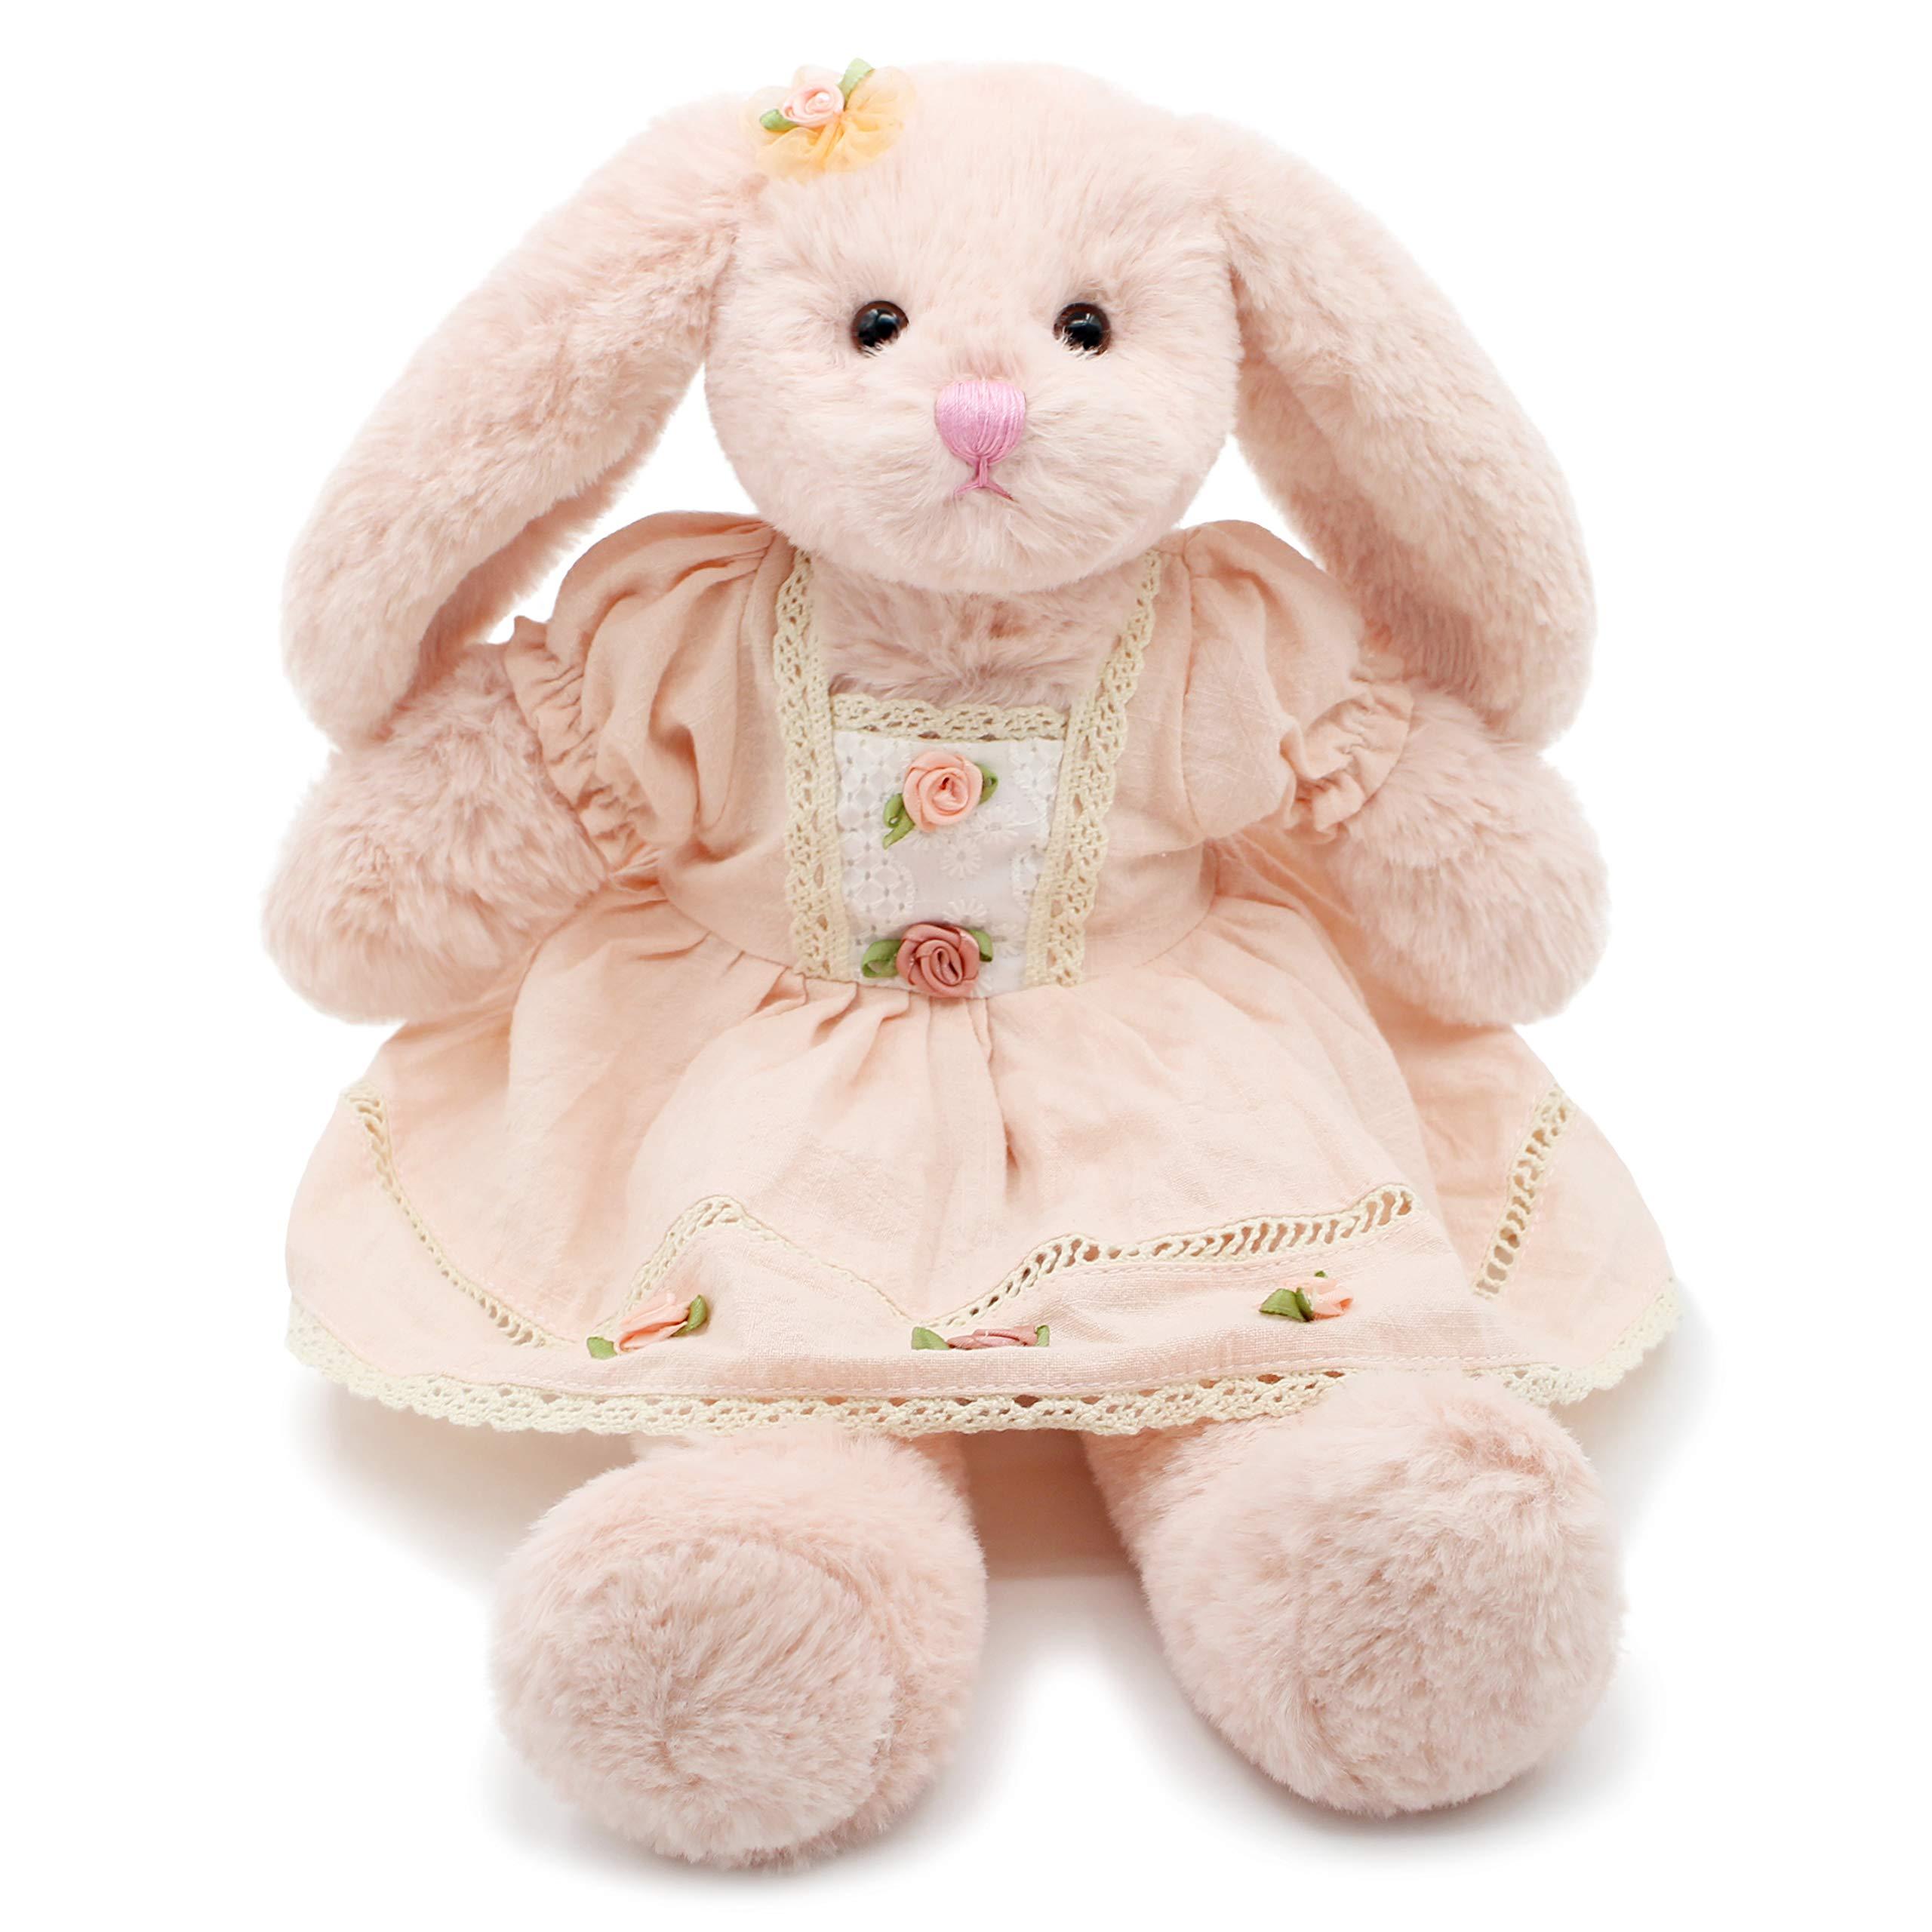 Oitscute Small Soft Stuffed Animal Bunny Rabbit Plush Toy for Baby Girls 15inch (Pink Rabbit Wearing Pink Vintage Dress) by oits cute